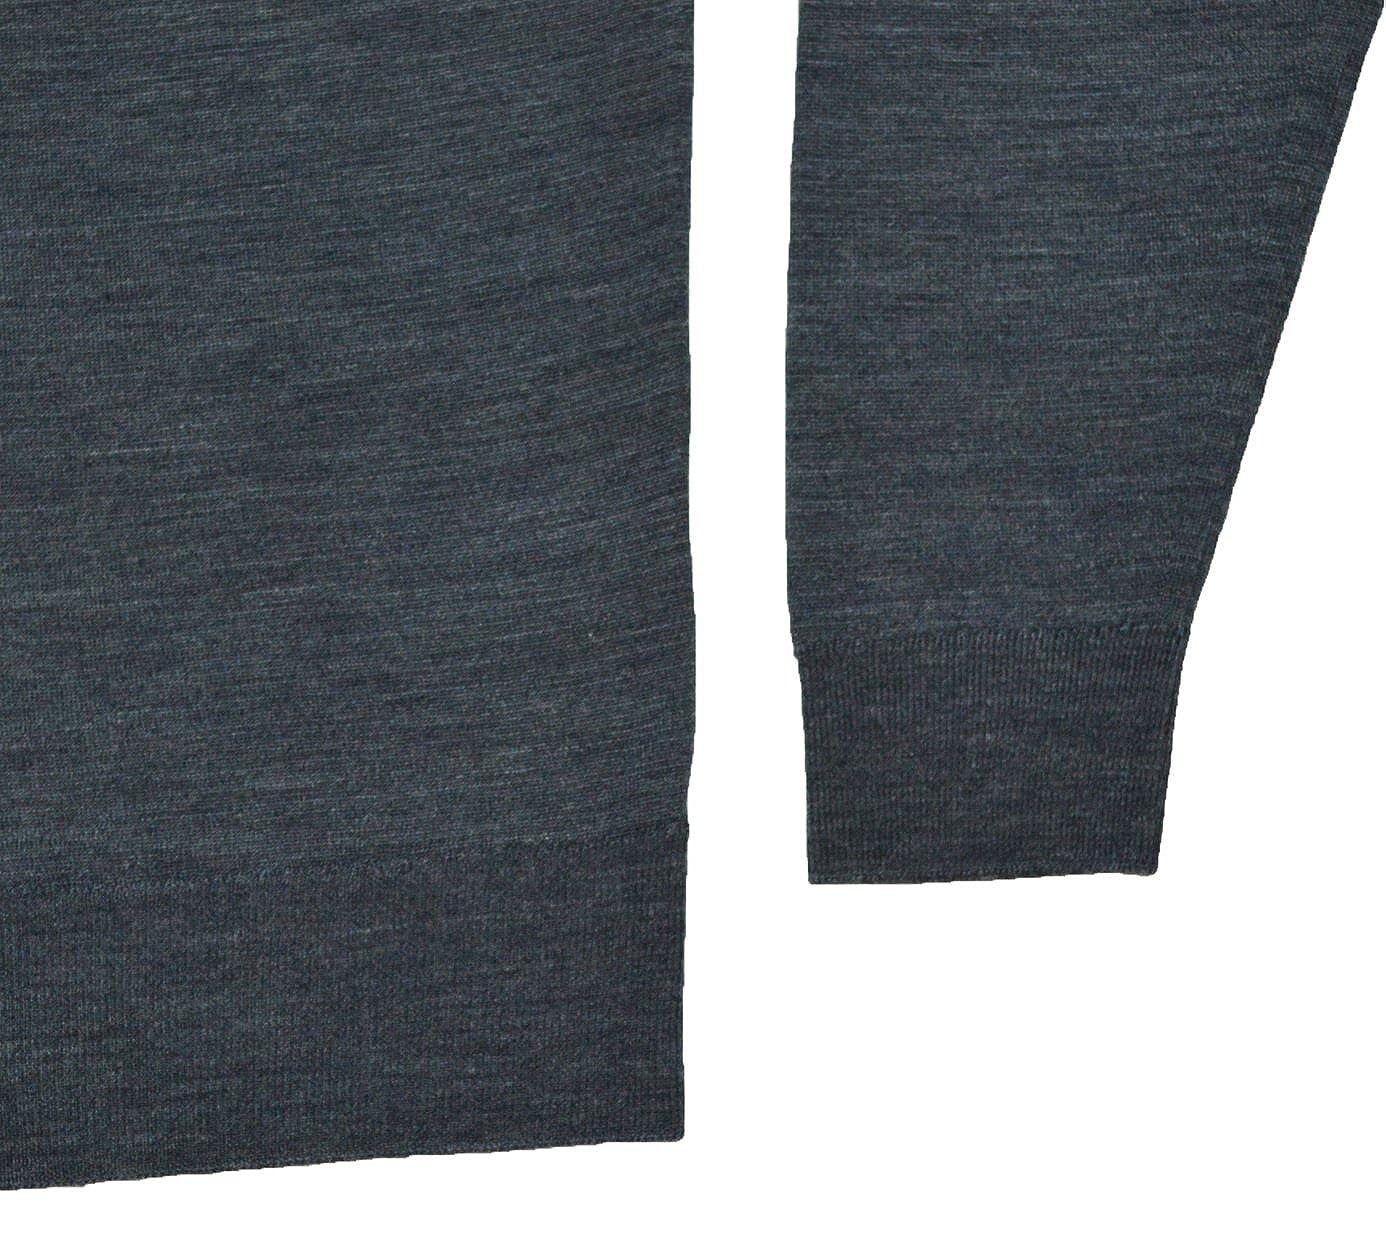 John Smedley Blenheim Pullover V Neck Long Sleeve Knitwear in 100/% Merino Wool